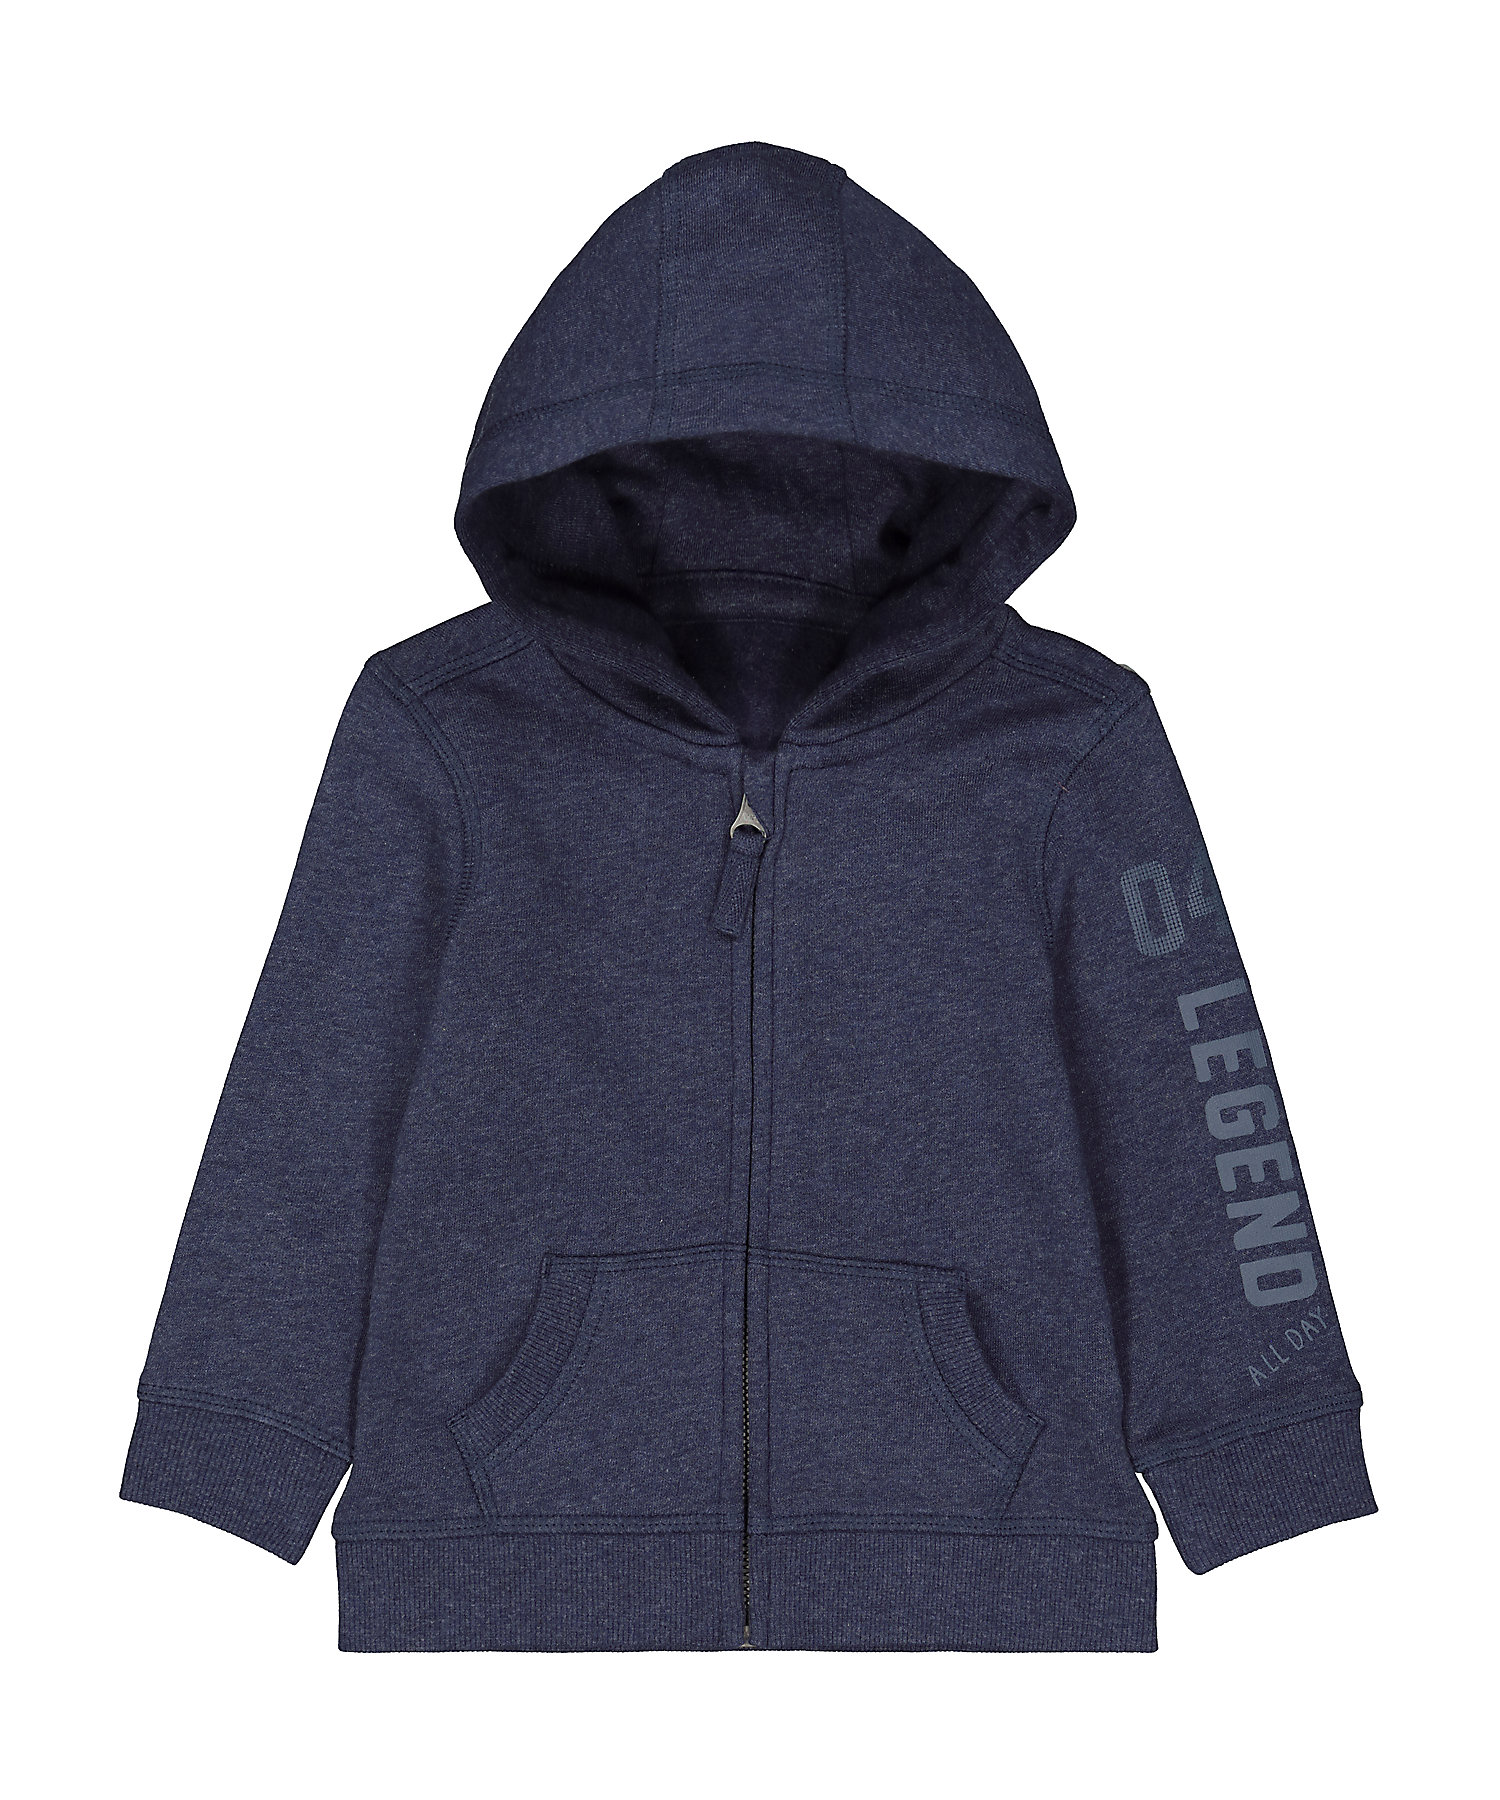 Mothercare | Boys Full Sleeves Hooded Sweatshirt Text Print - Navy